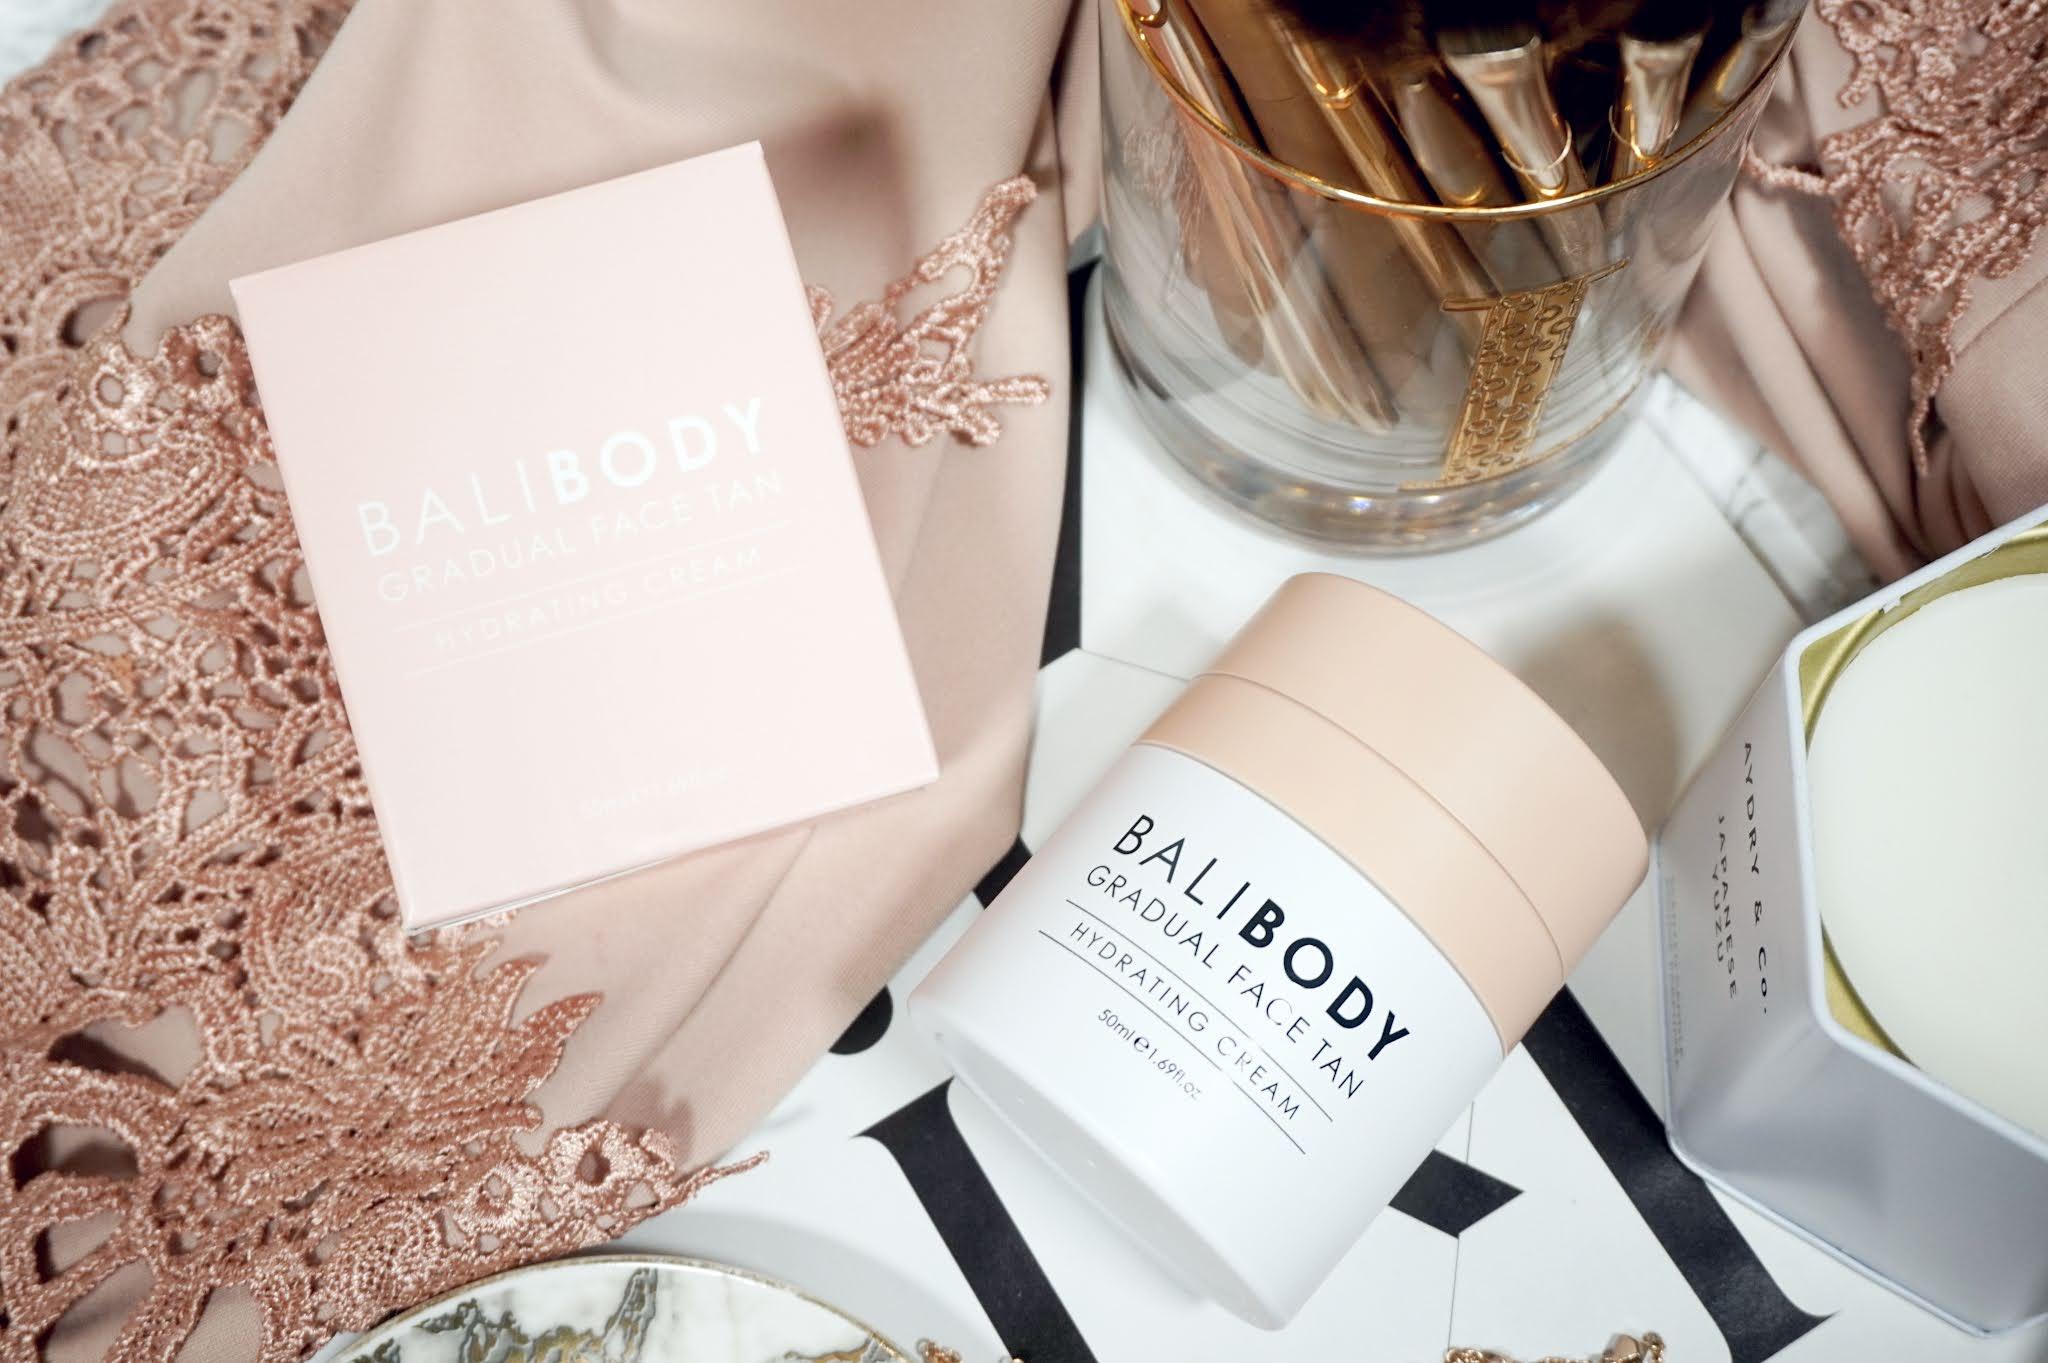 Bali Body Gradual Face Tan Review